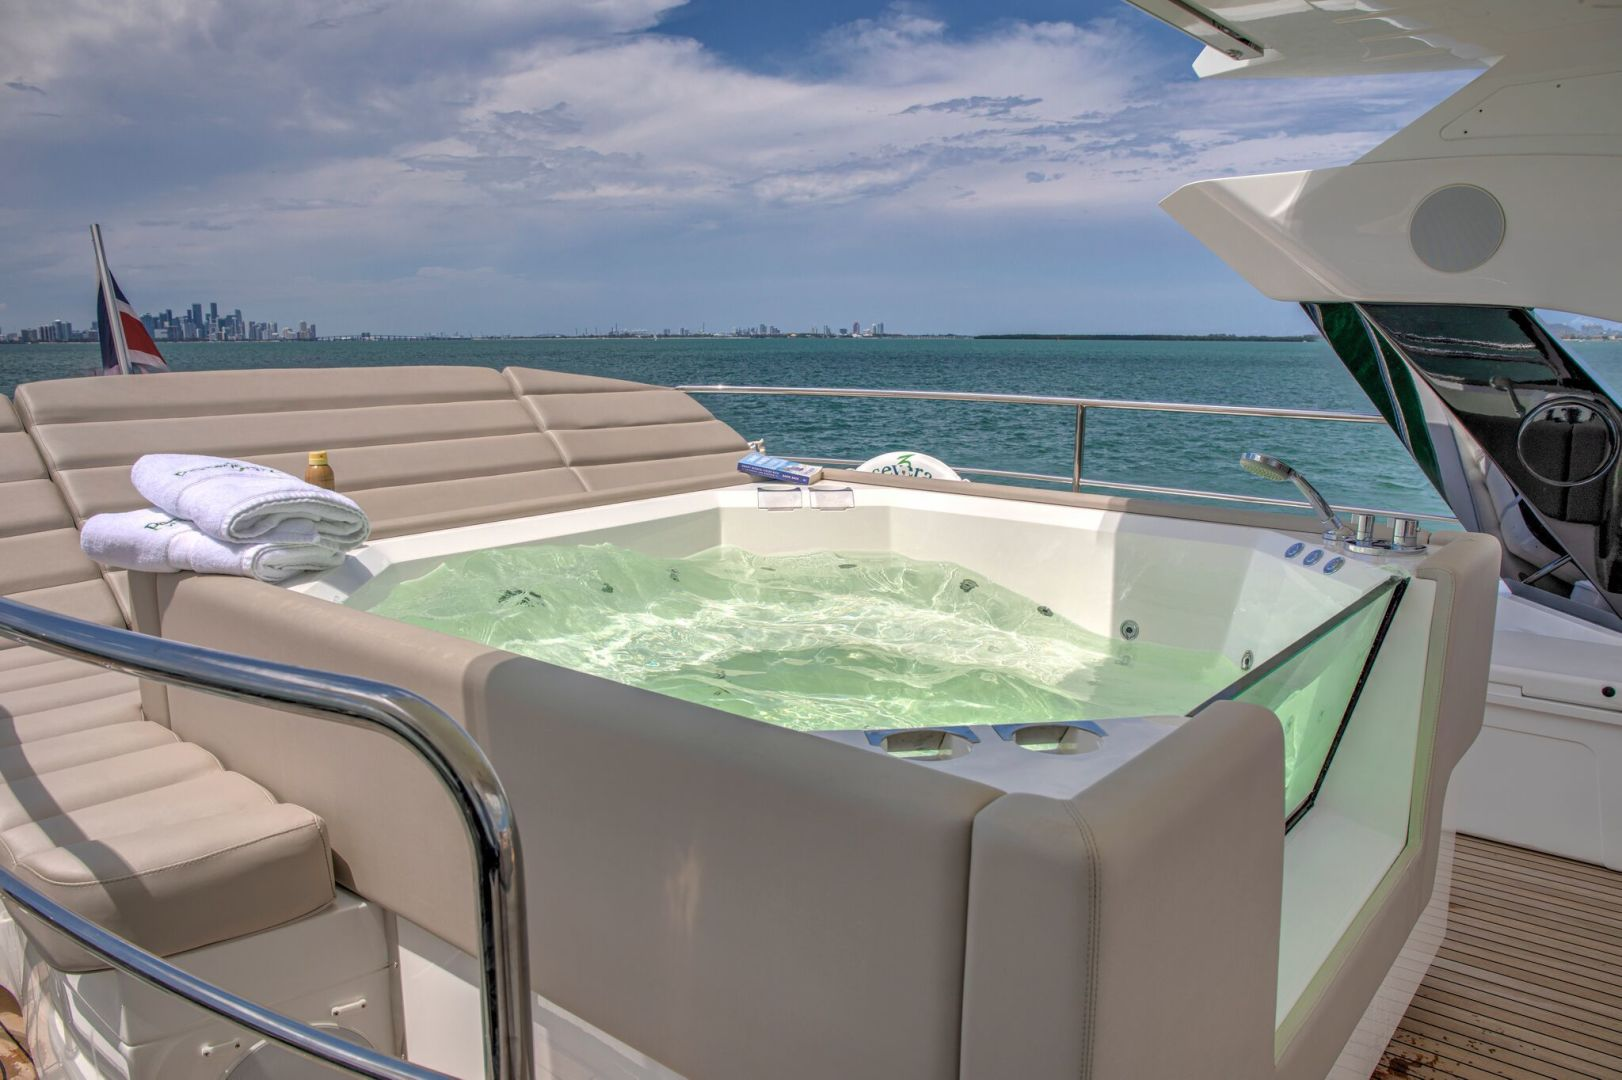 Sunseeker-95 Yacht 2017-Perseverance 3 Ft Lauderdale-Florida-United States-1400117   Thumbnail